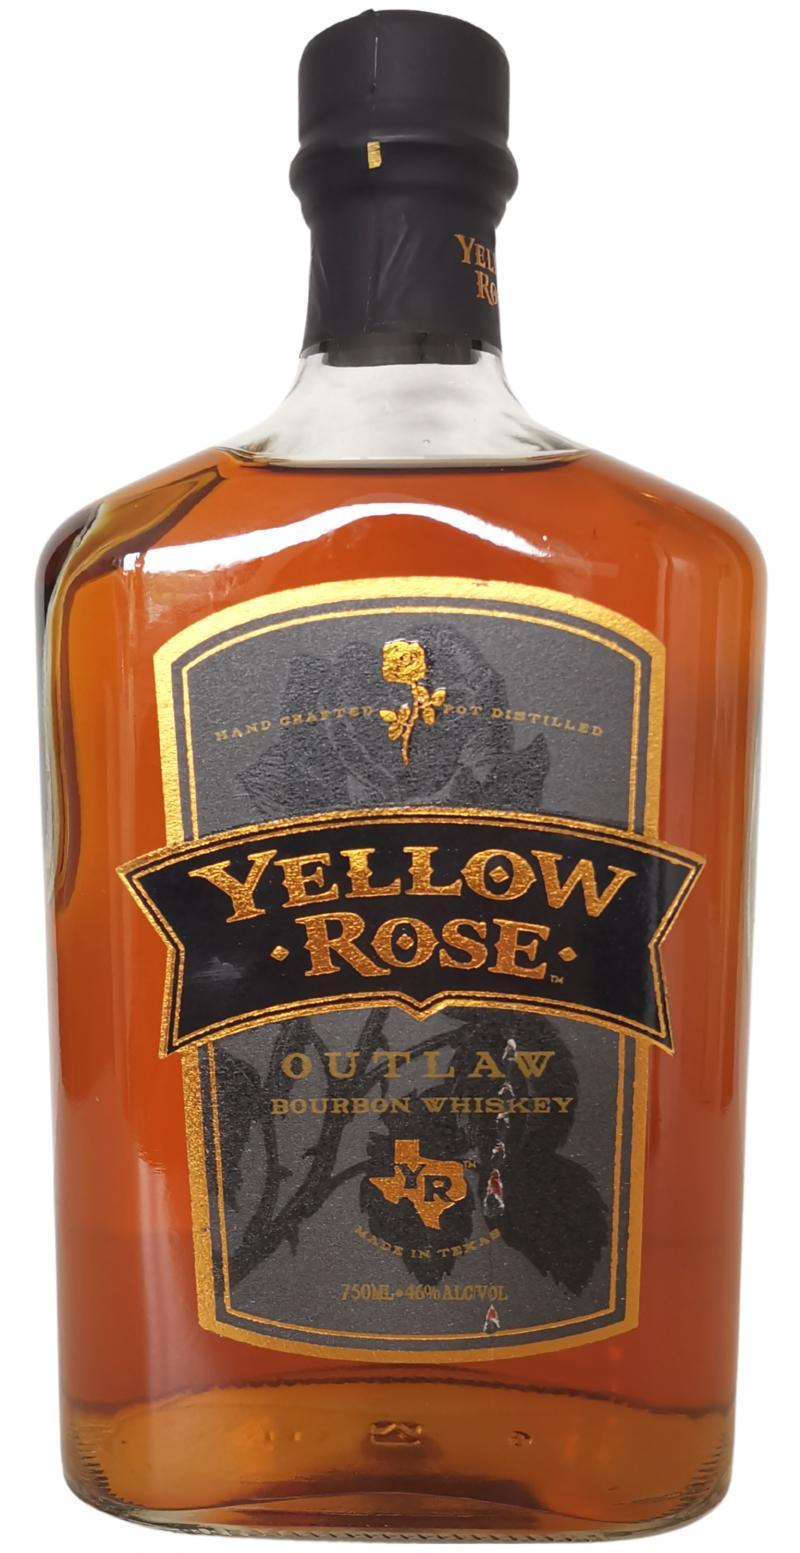 Yellow Rose Outlaw Bourbon Whiskey